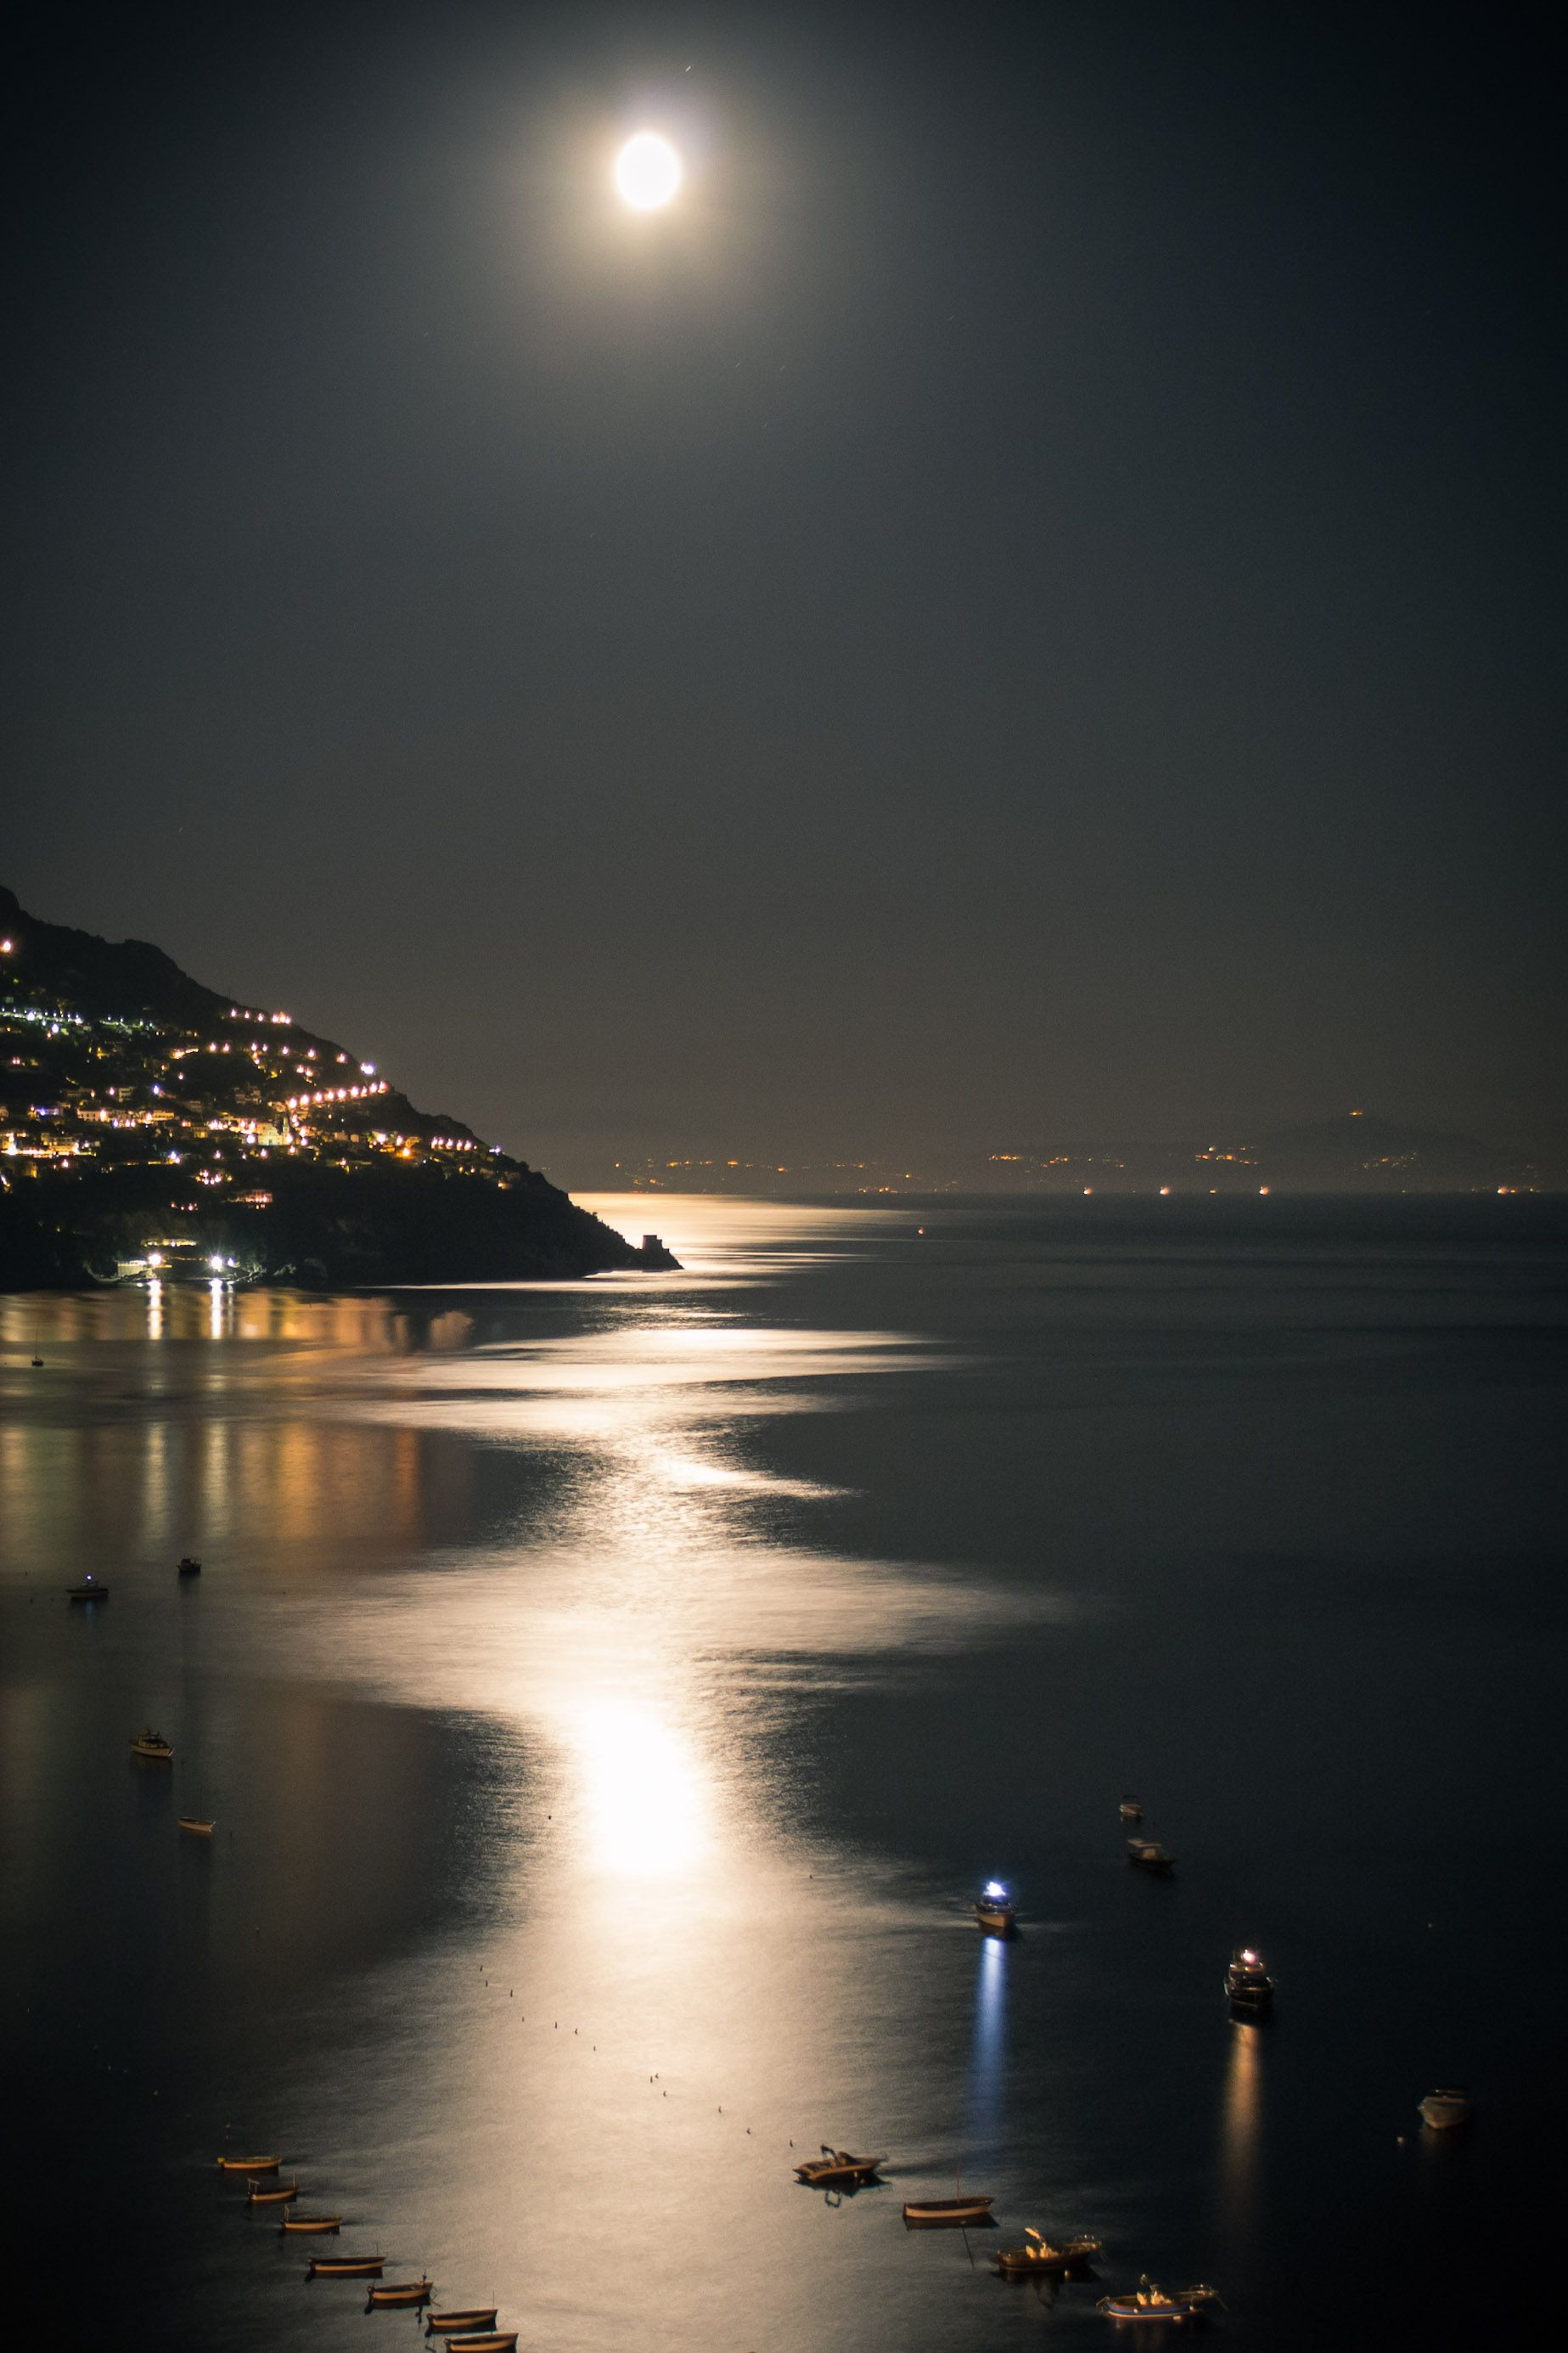 Moonliight Positano Italy If Money Were No Object Beautiful Moon Landscape Night Skies